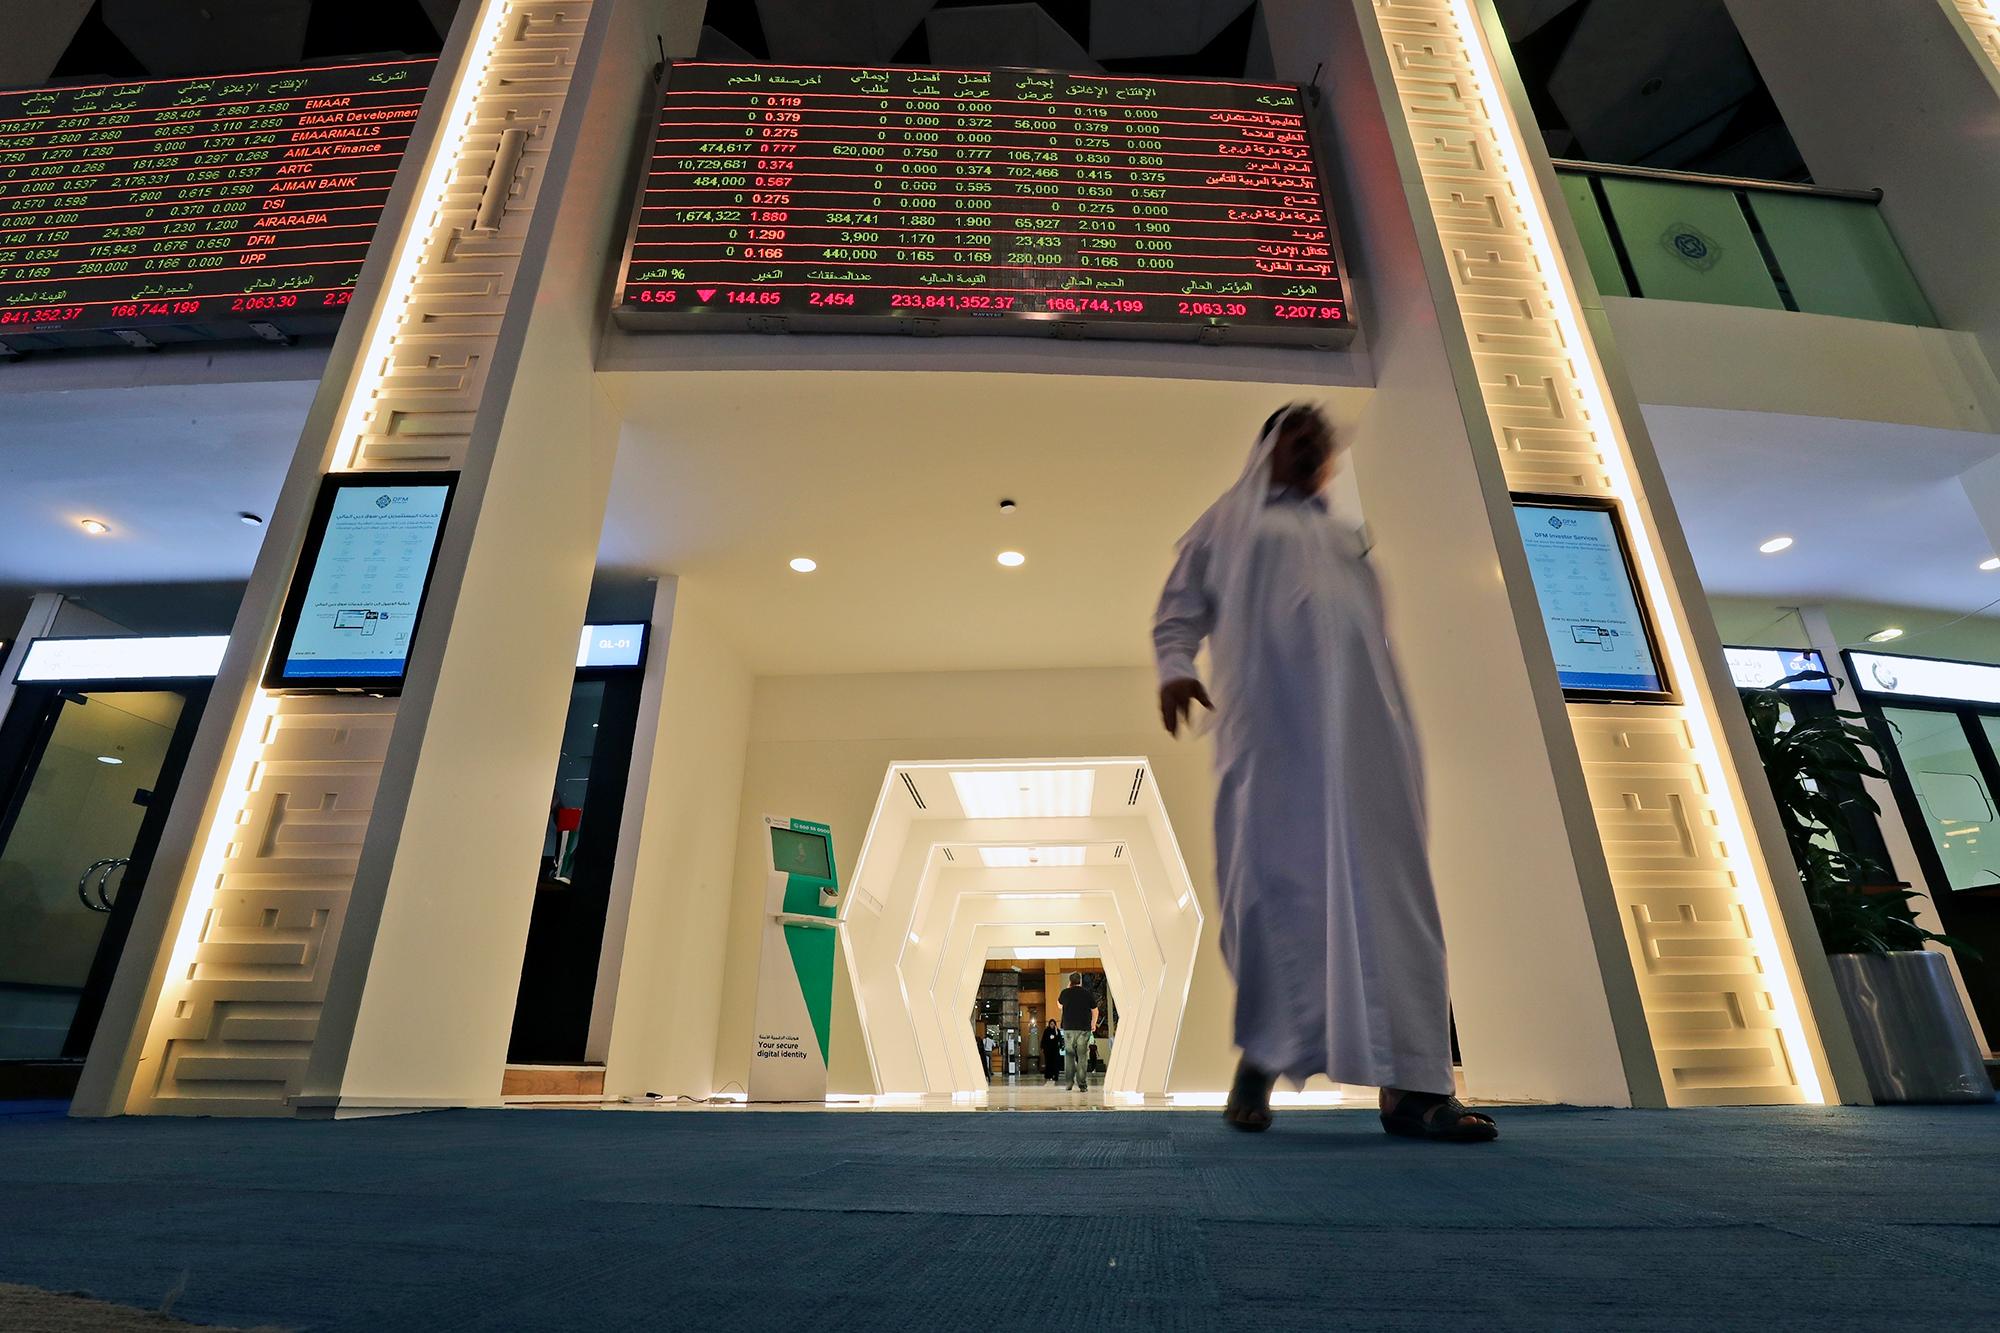 A trader arrives at the Dubai Financial Market in Dubai, United Arab Emirates, Thursday, March 12.